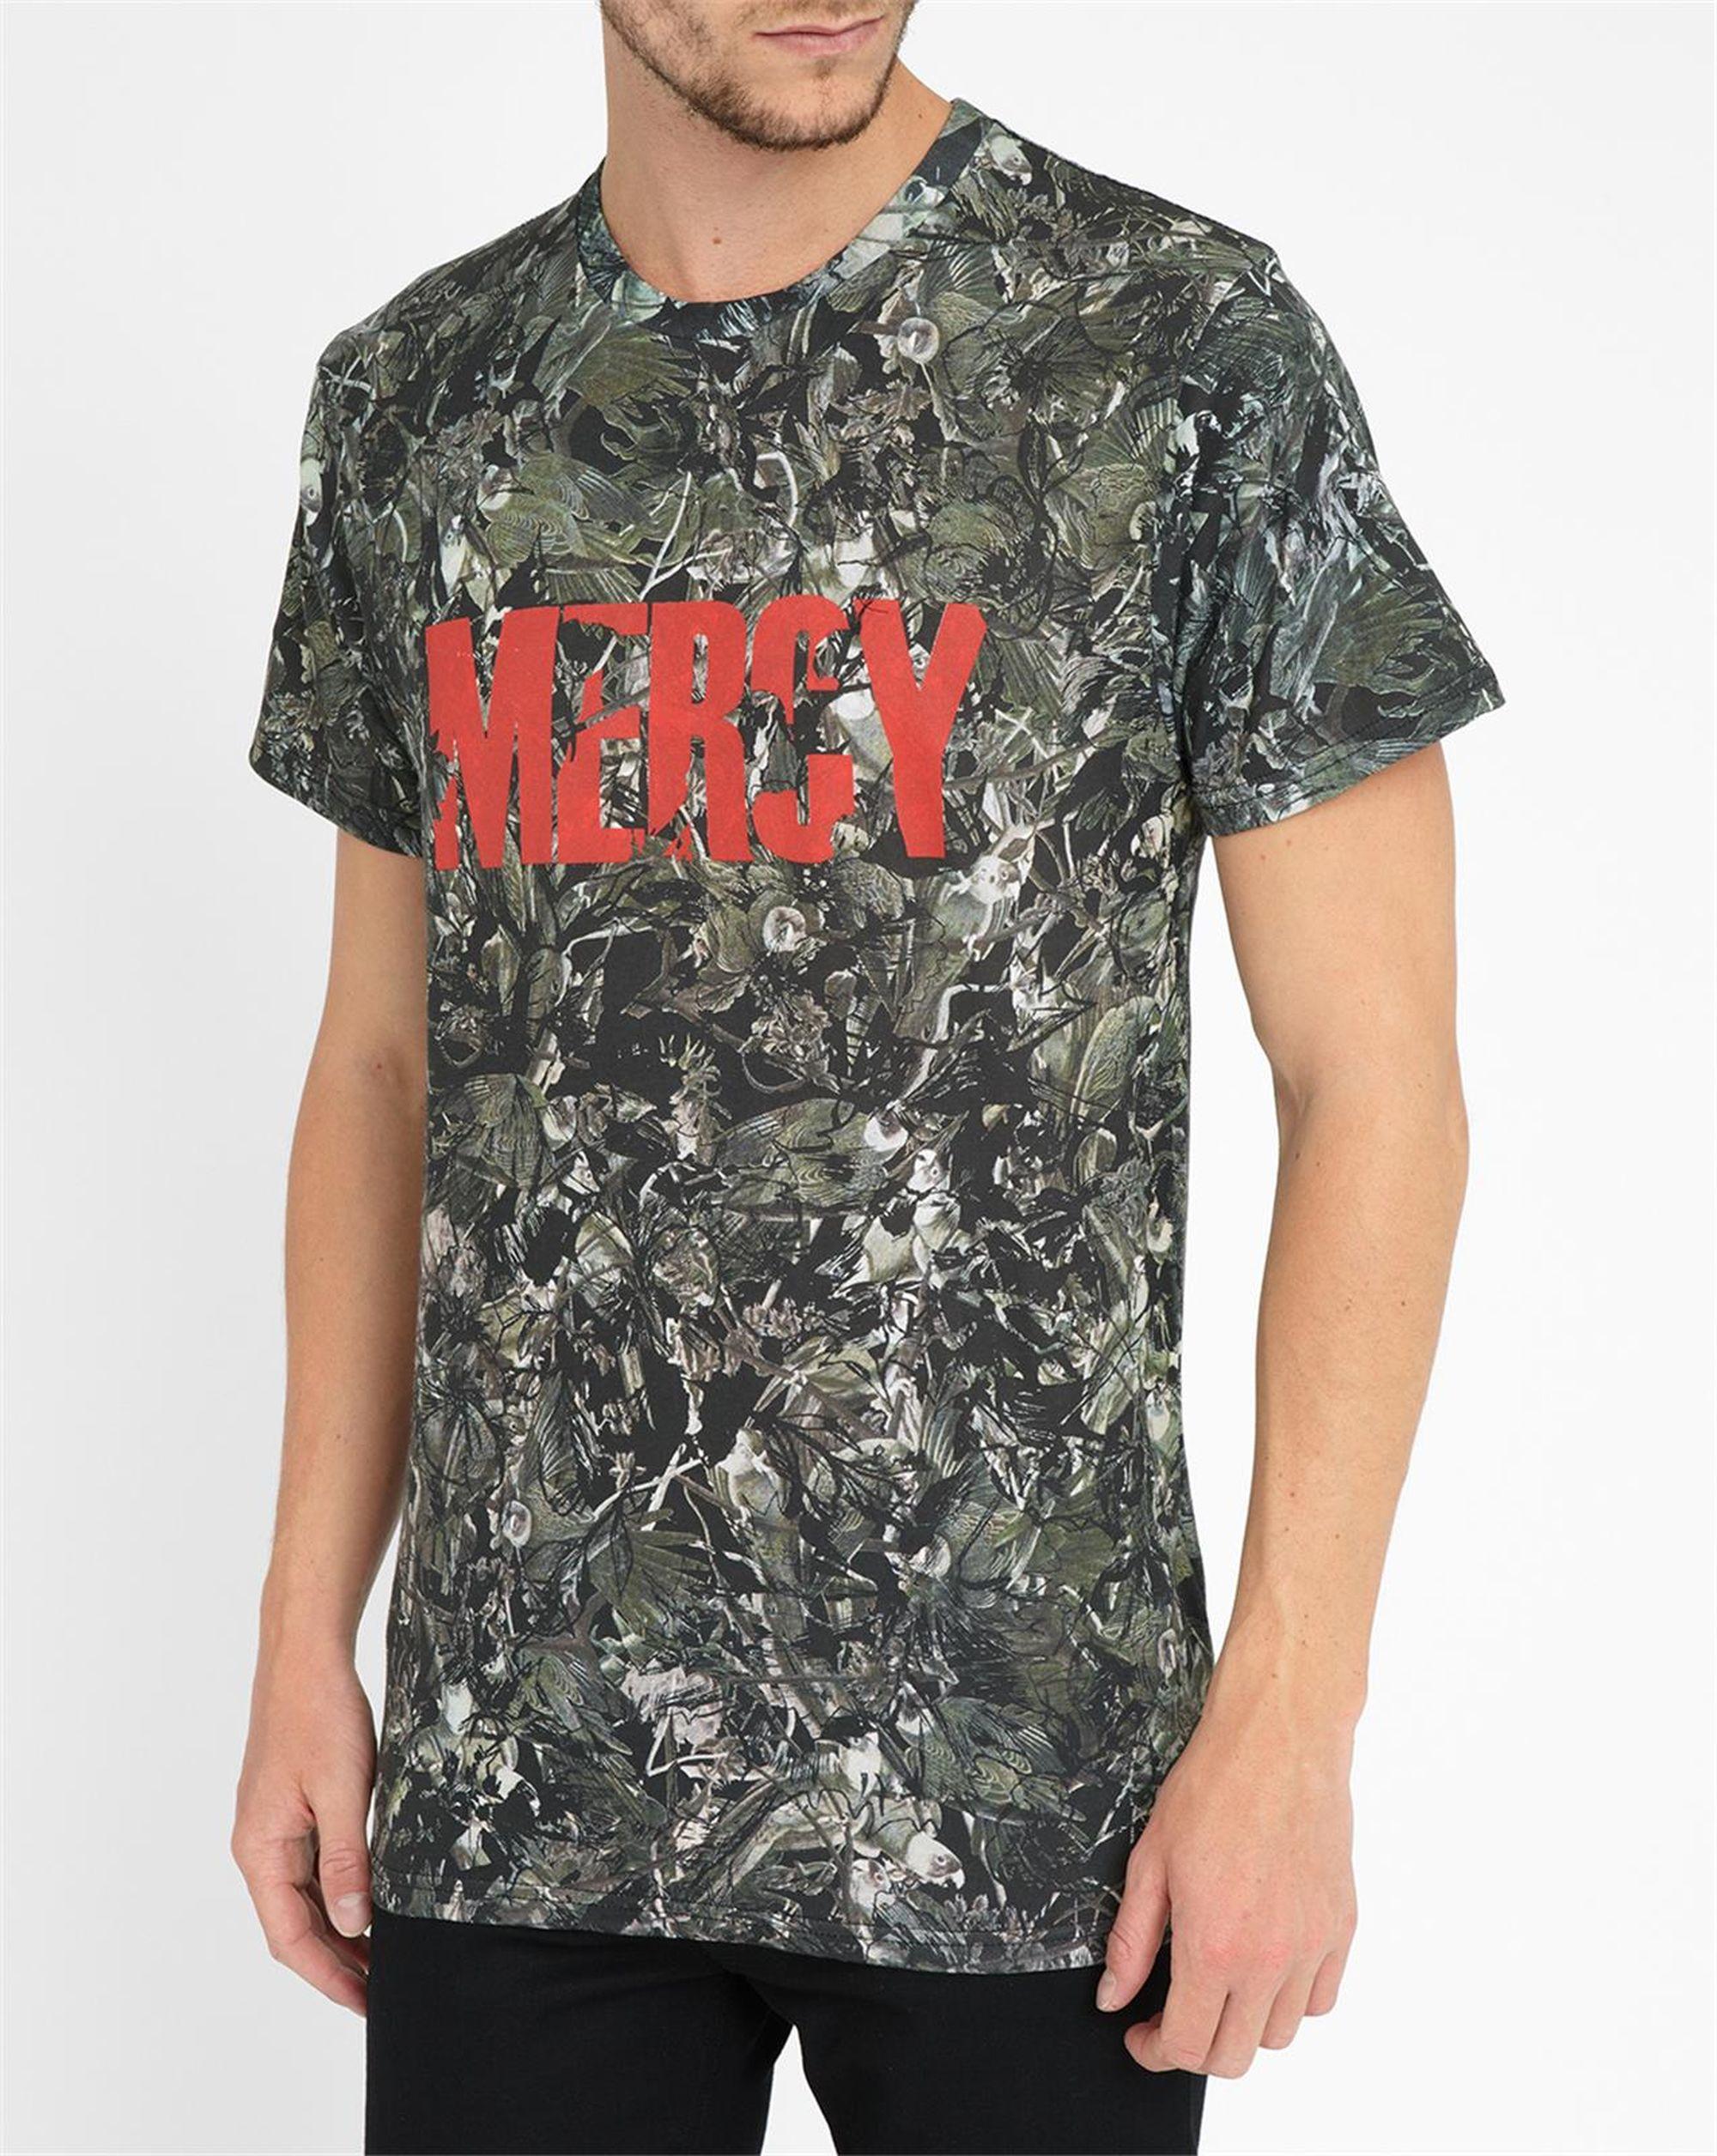 eleven paris camouflage mercy t shirt in natural for men lyst. Black Bedroom Furniture Sets. Home Design Ideas